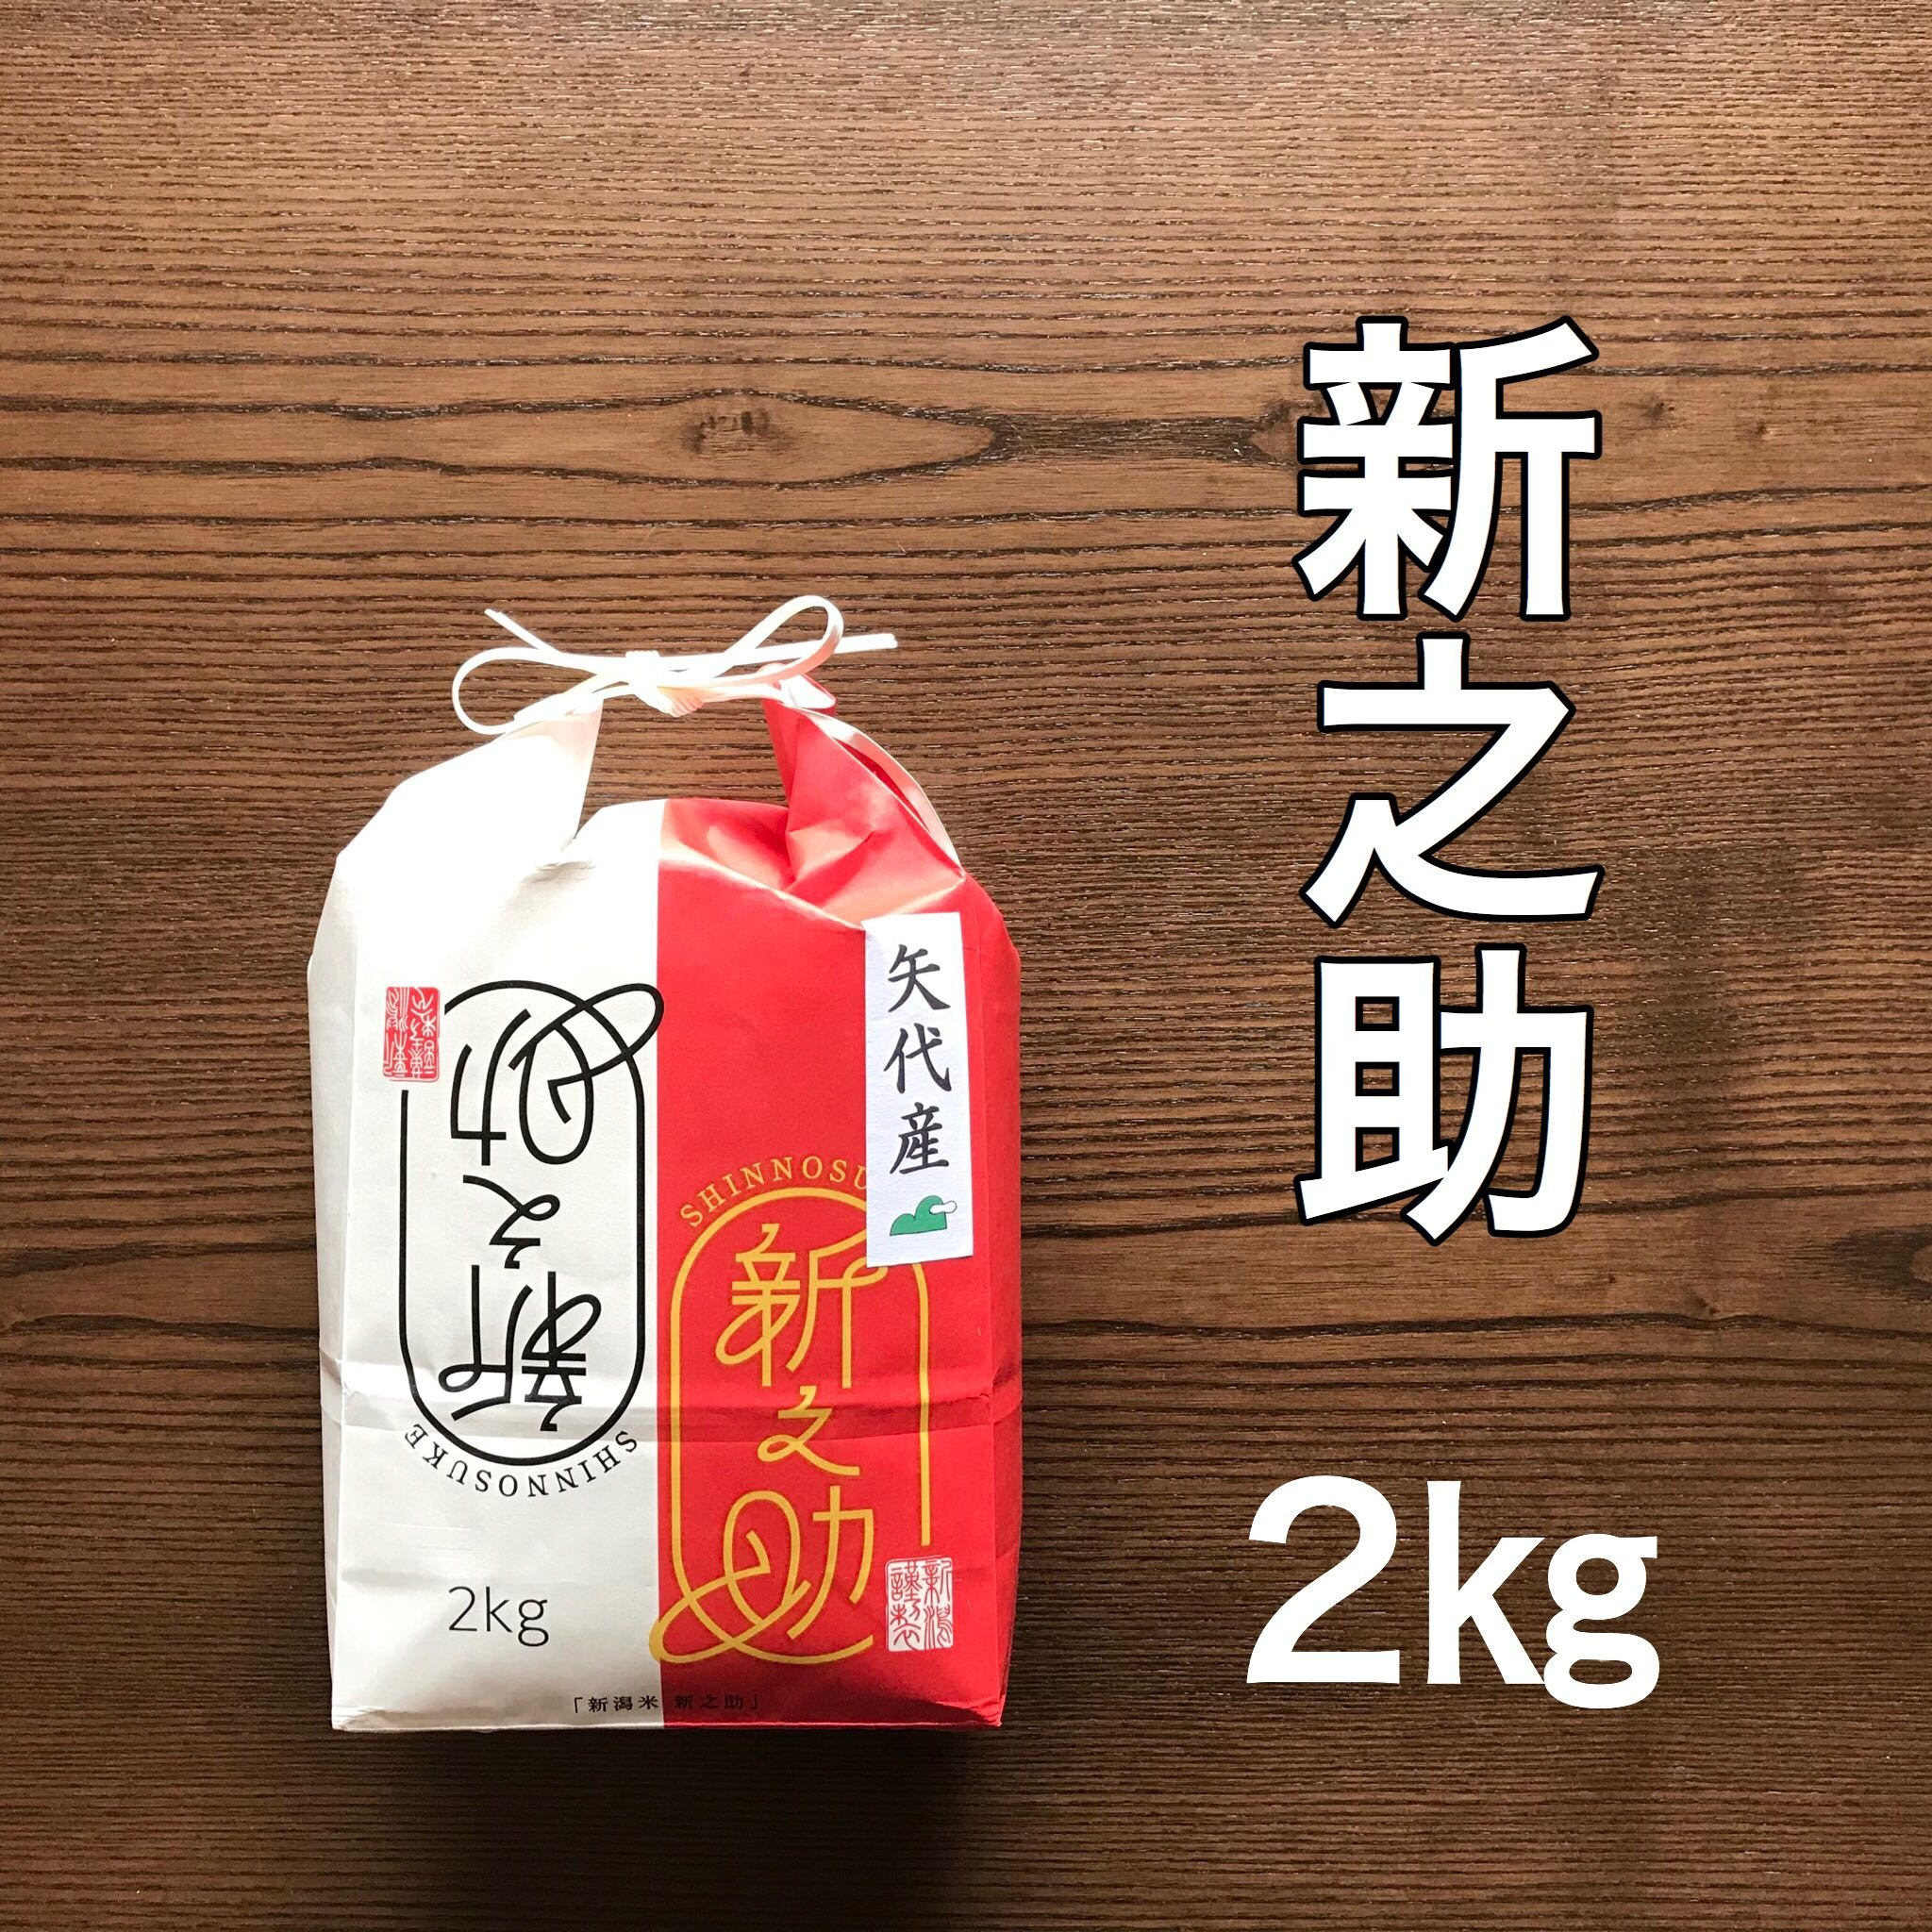 妙高矢代産新之助 白米 2キロ